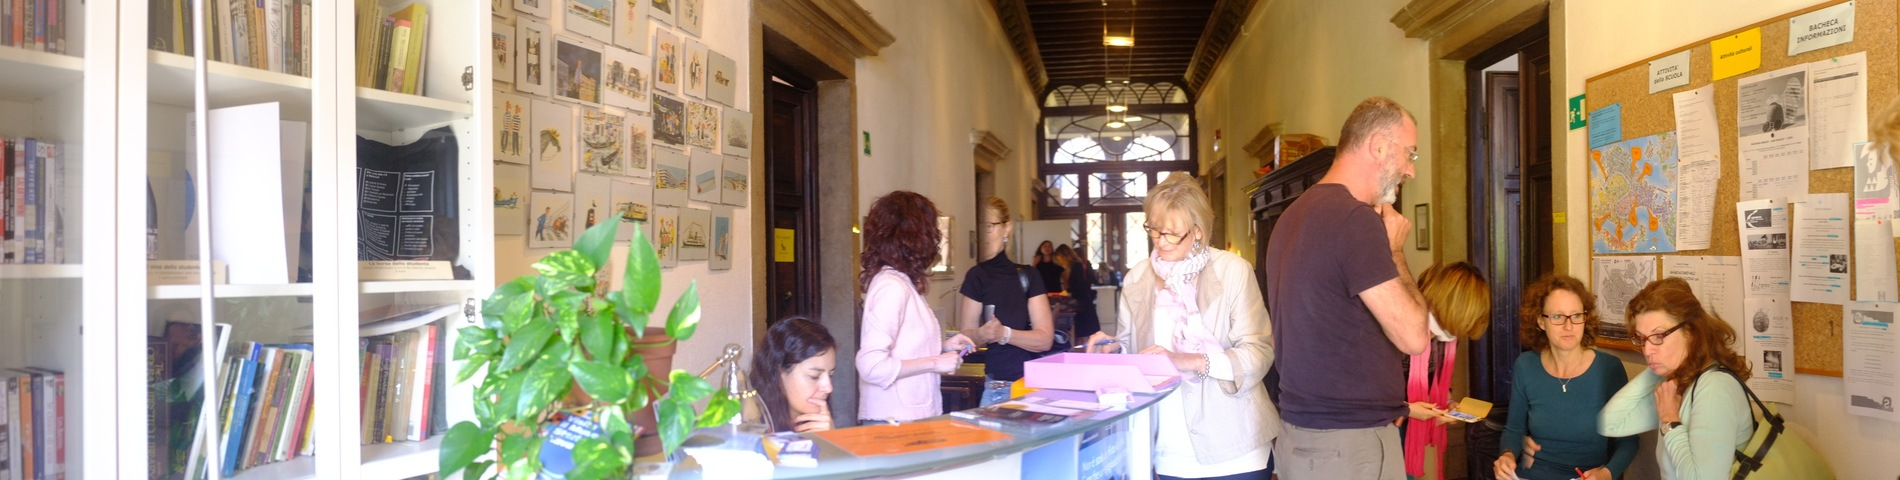 Venice Language School picture 1